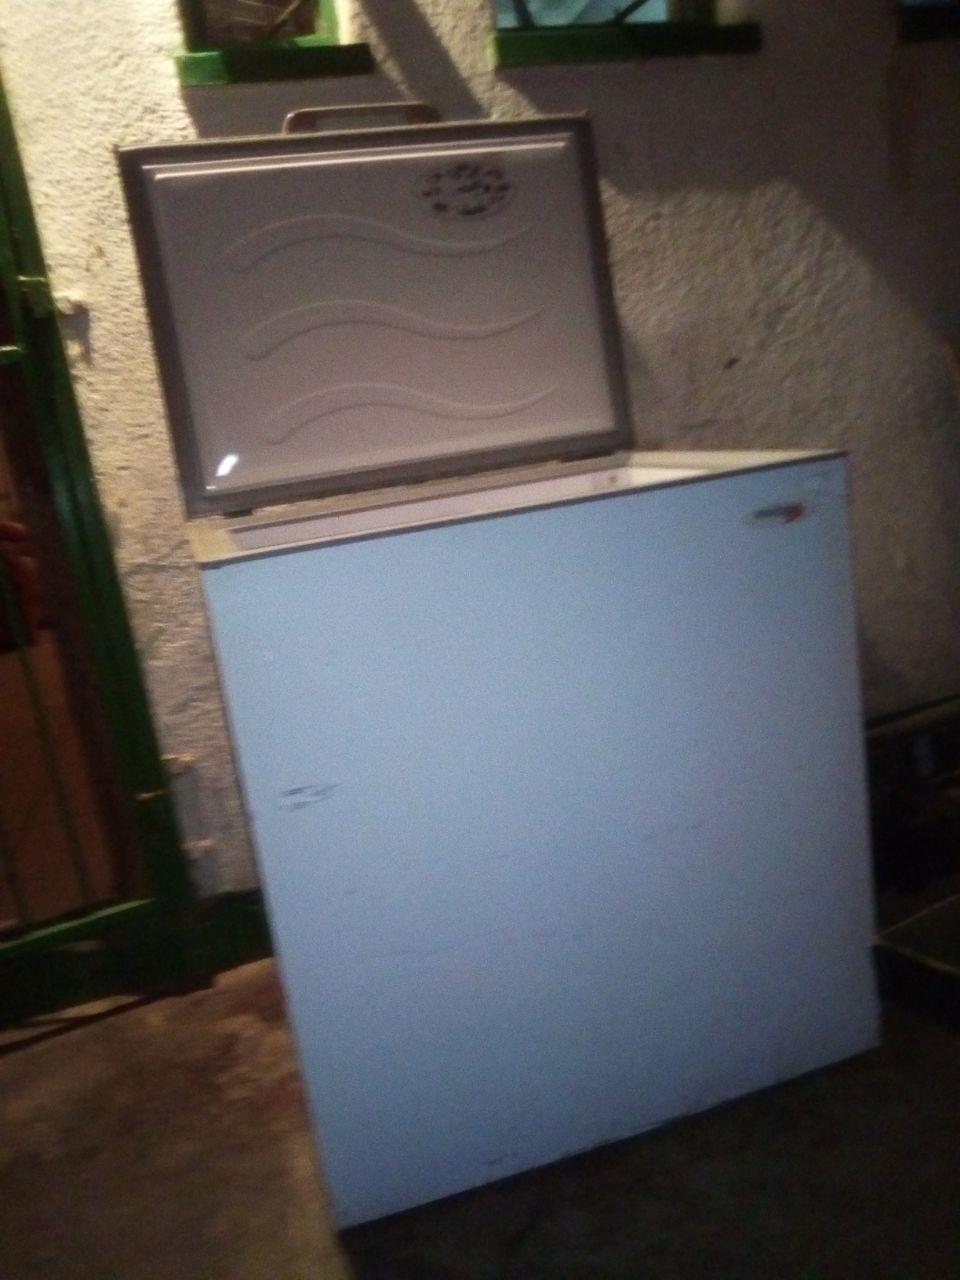 210 l chest freezer